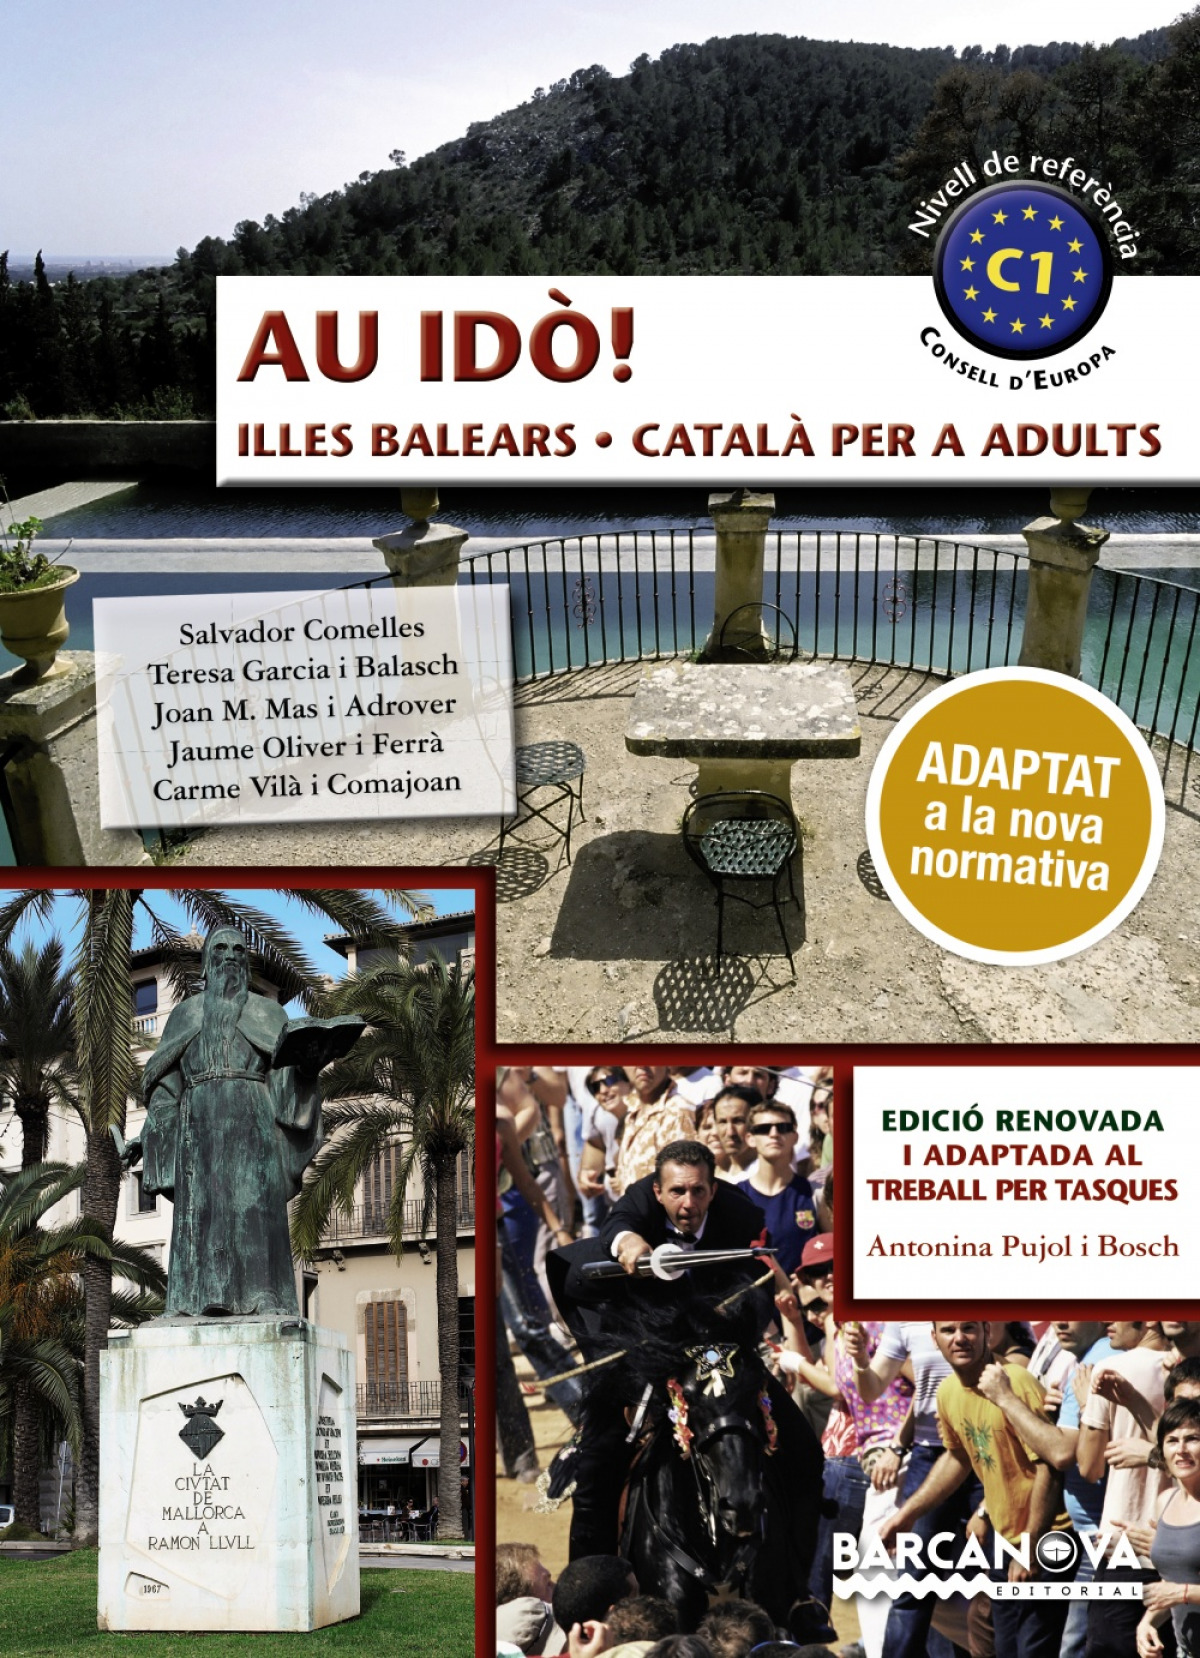 (BAL).AU IDO!.CATALA PER A ADULTS.(C1).ILLES BALEARS